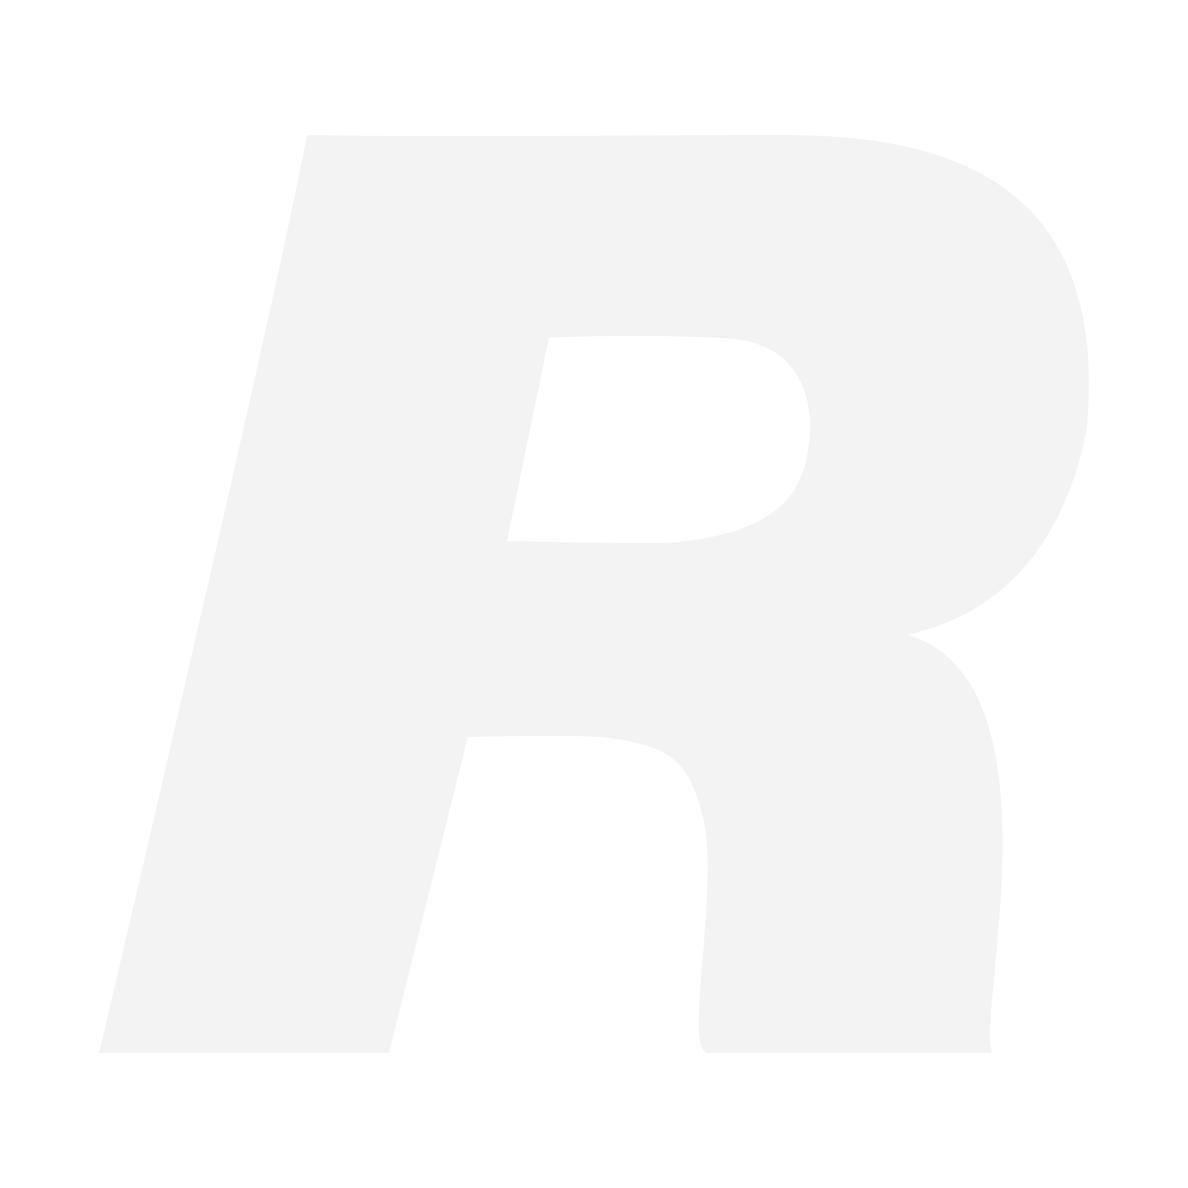 Rajala Staff - Flashes! -valokuvanäyttely, Postitalo 4.1.-9.2.2019